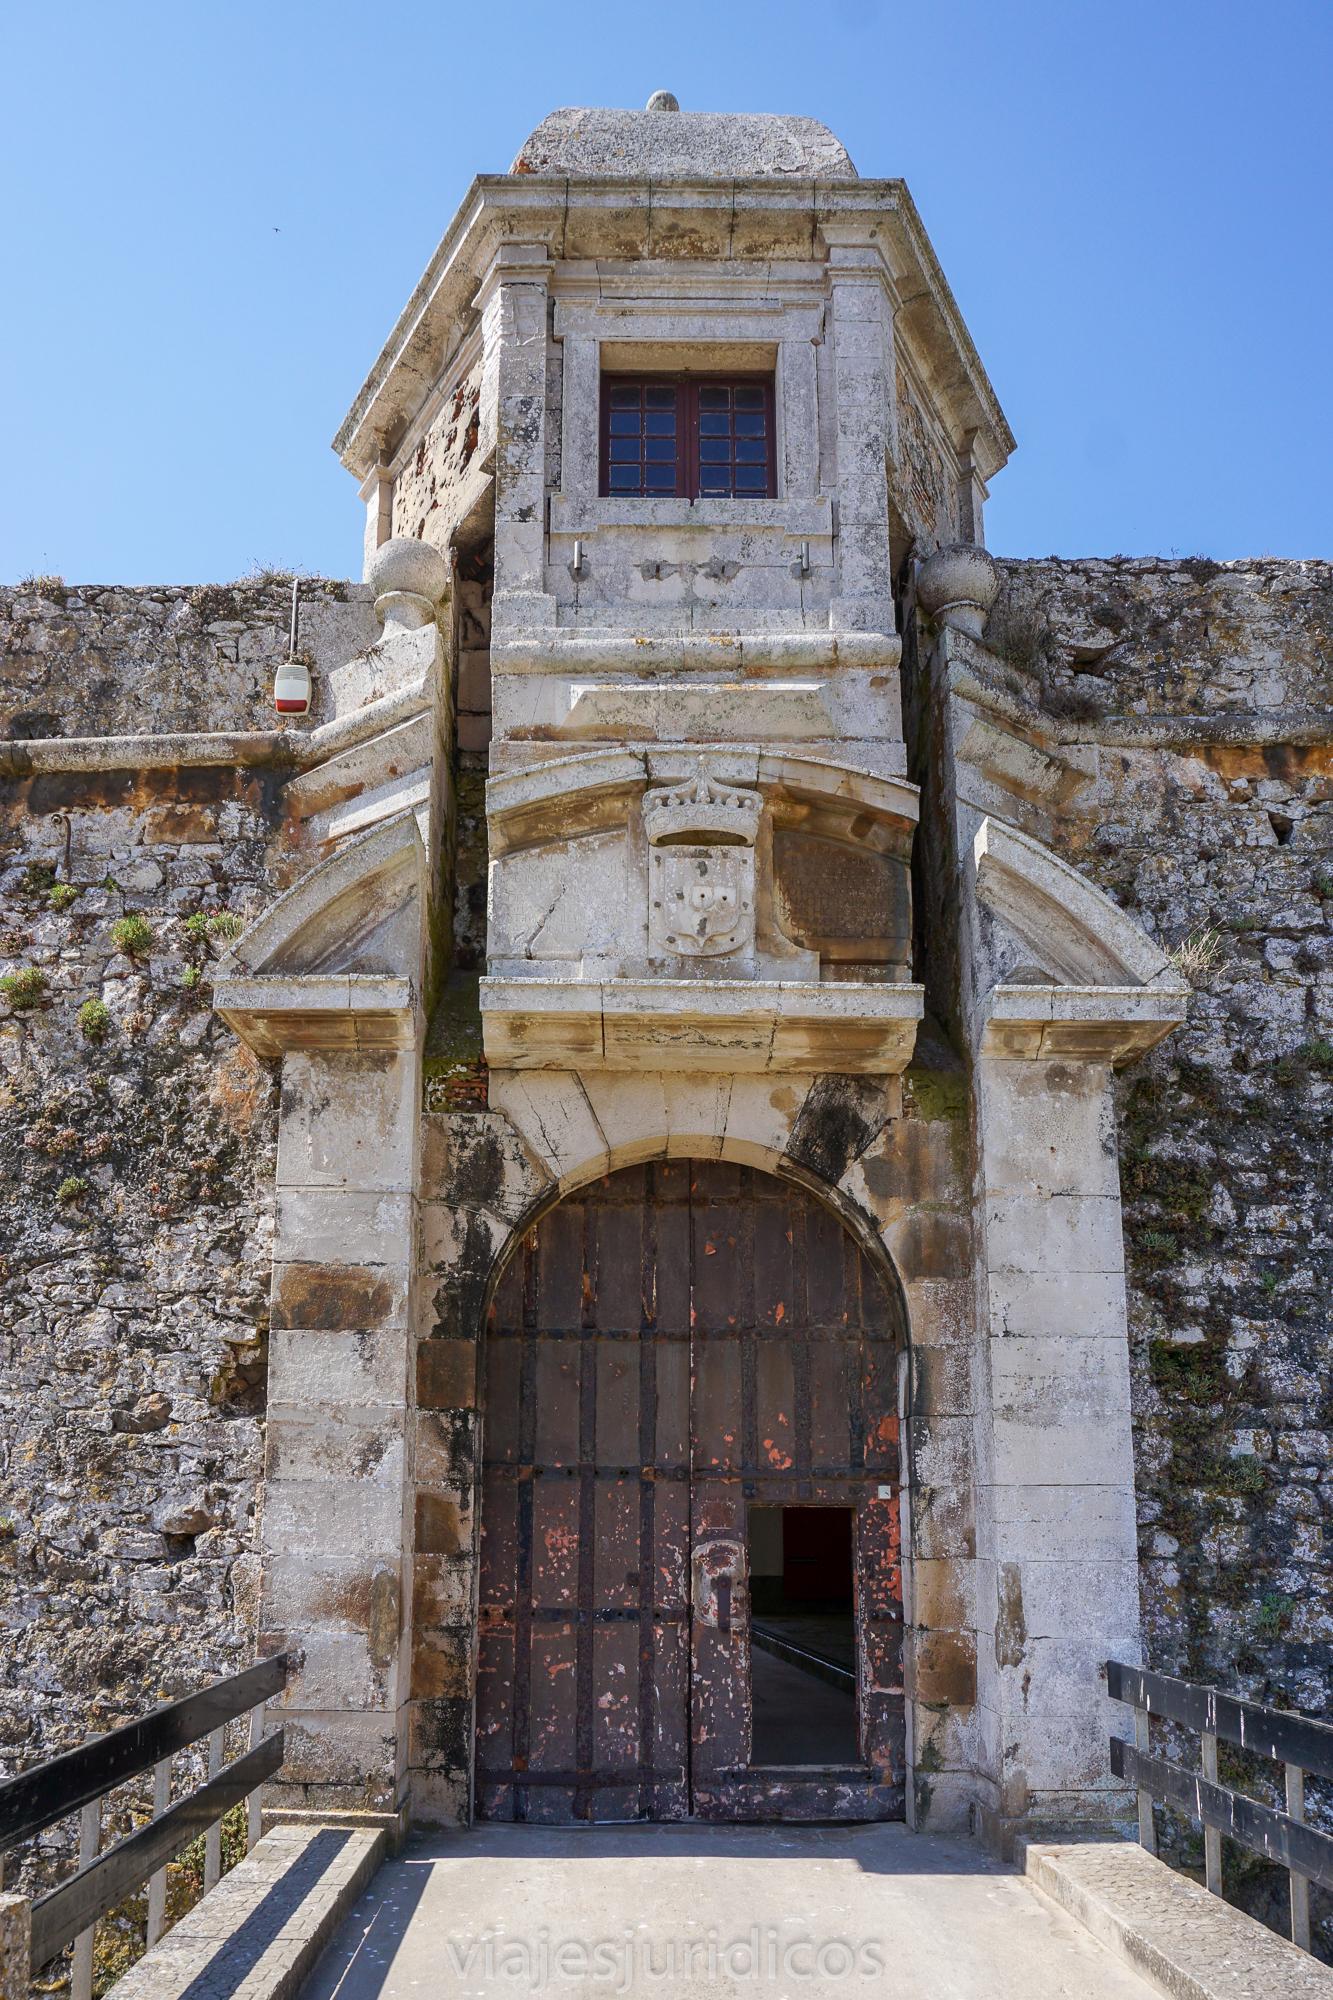 Fortaleza Peniche museo de la resistencia y libertad